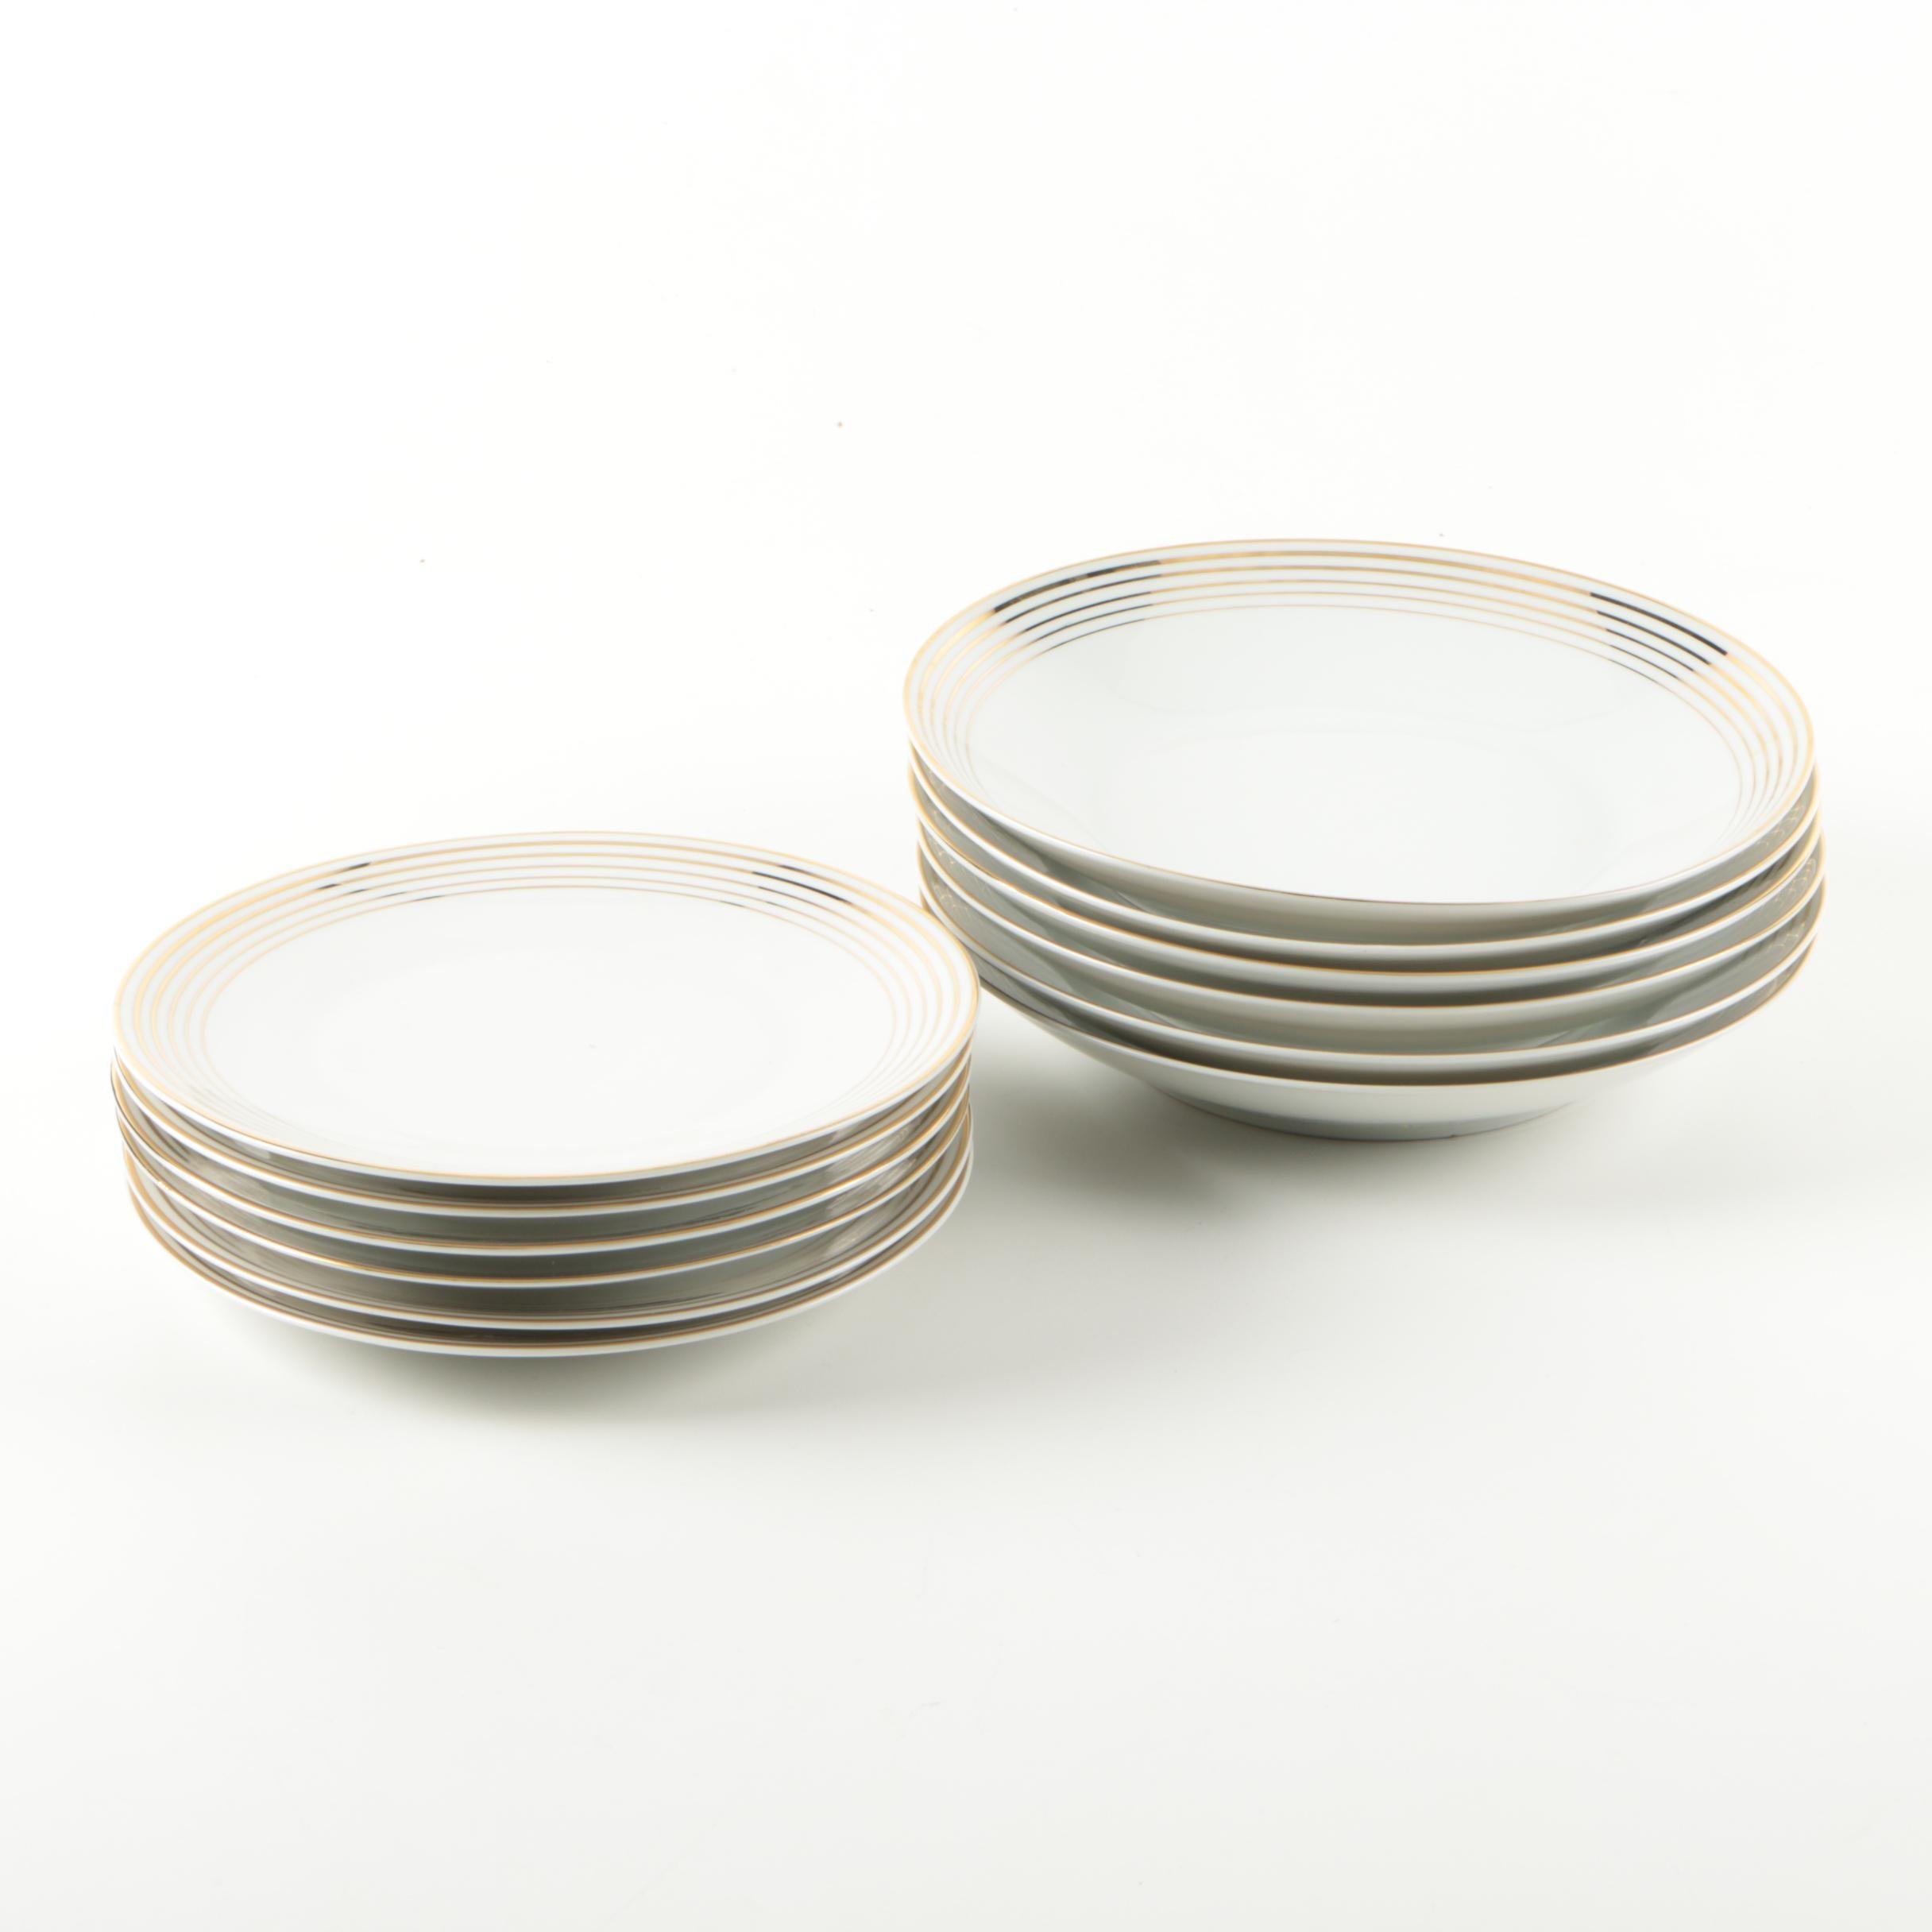 "Plankenhammer Germany ""Floss"" Porcelain Plates and Bowls"